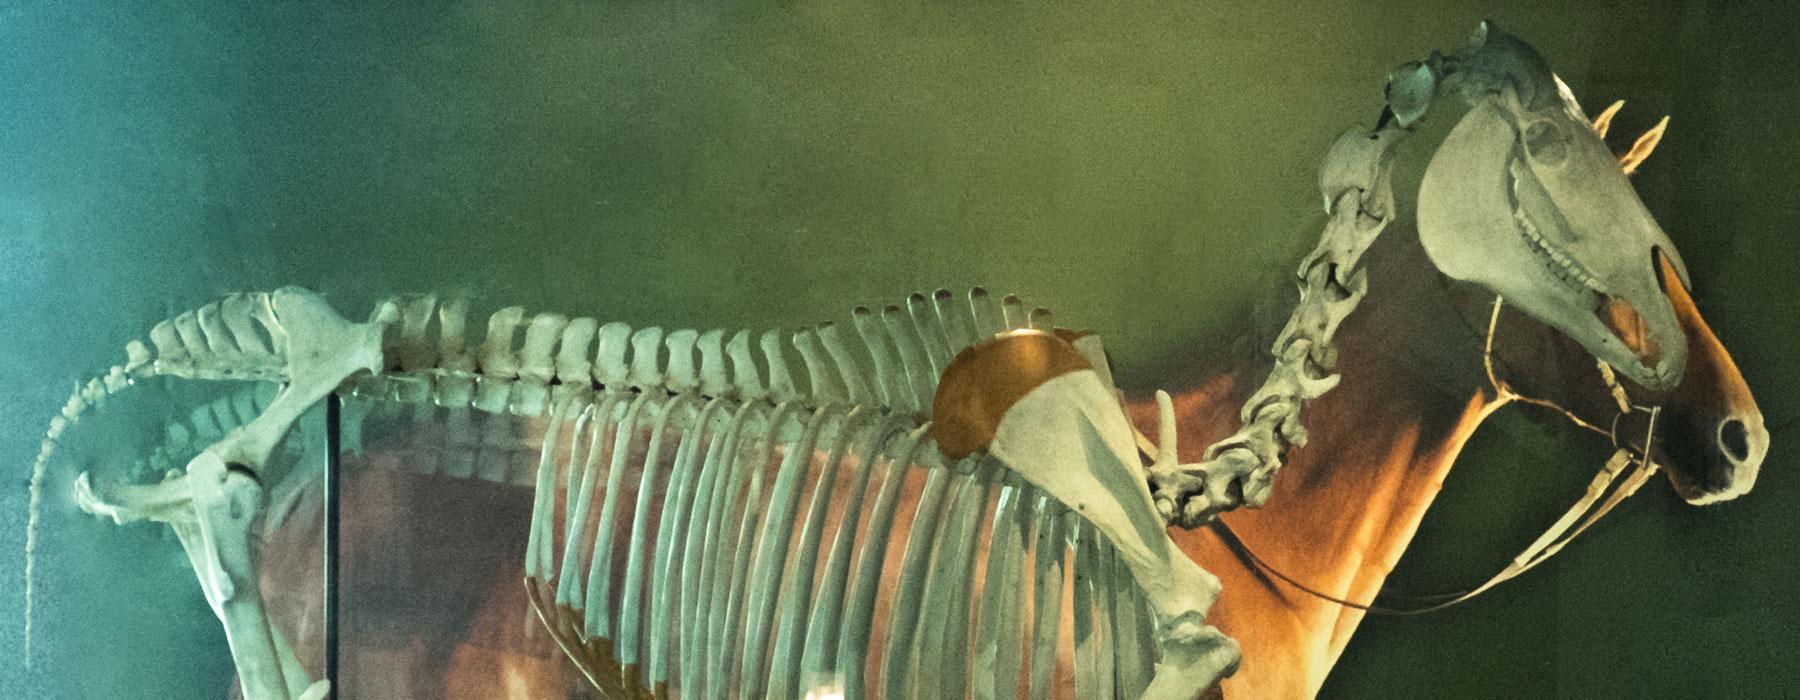 Phar lap skeleton